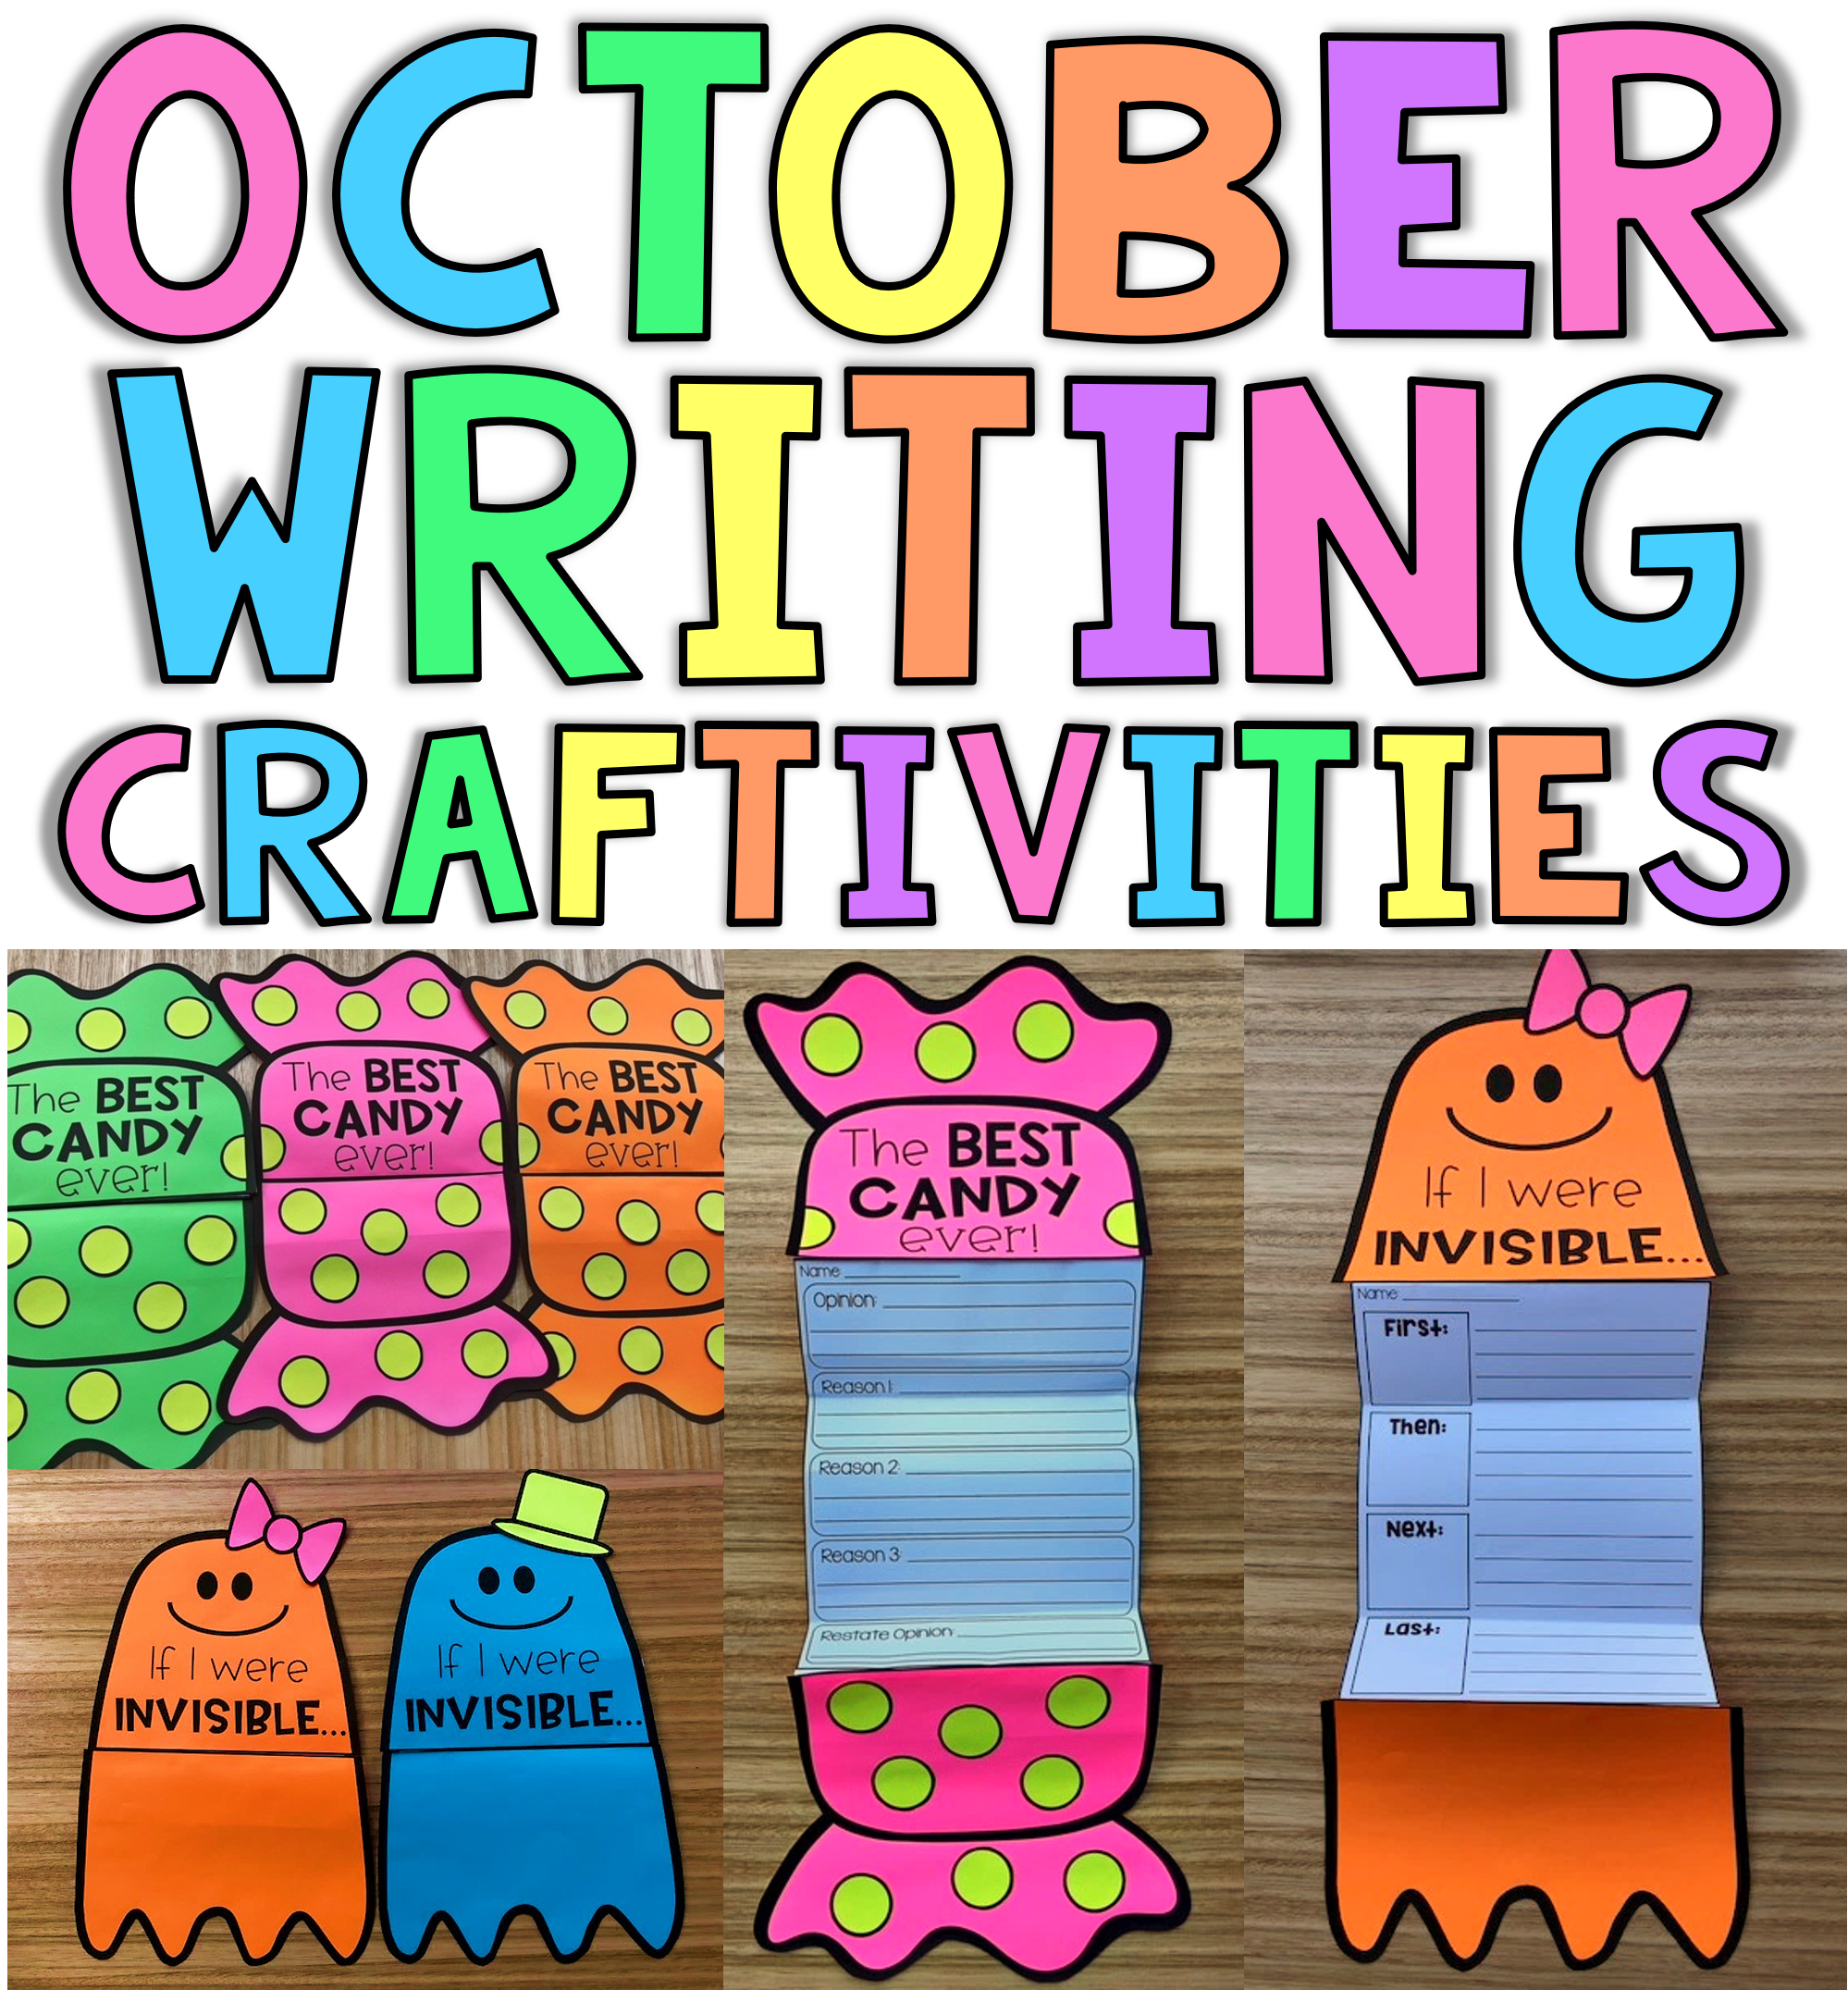 October Writing Craftivities